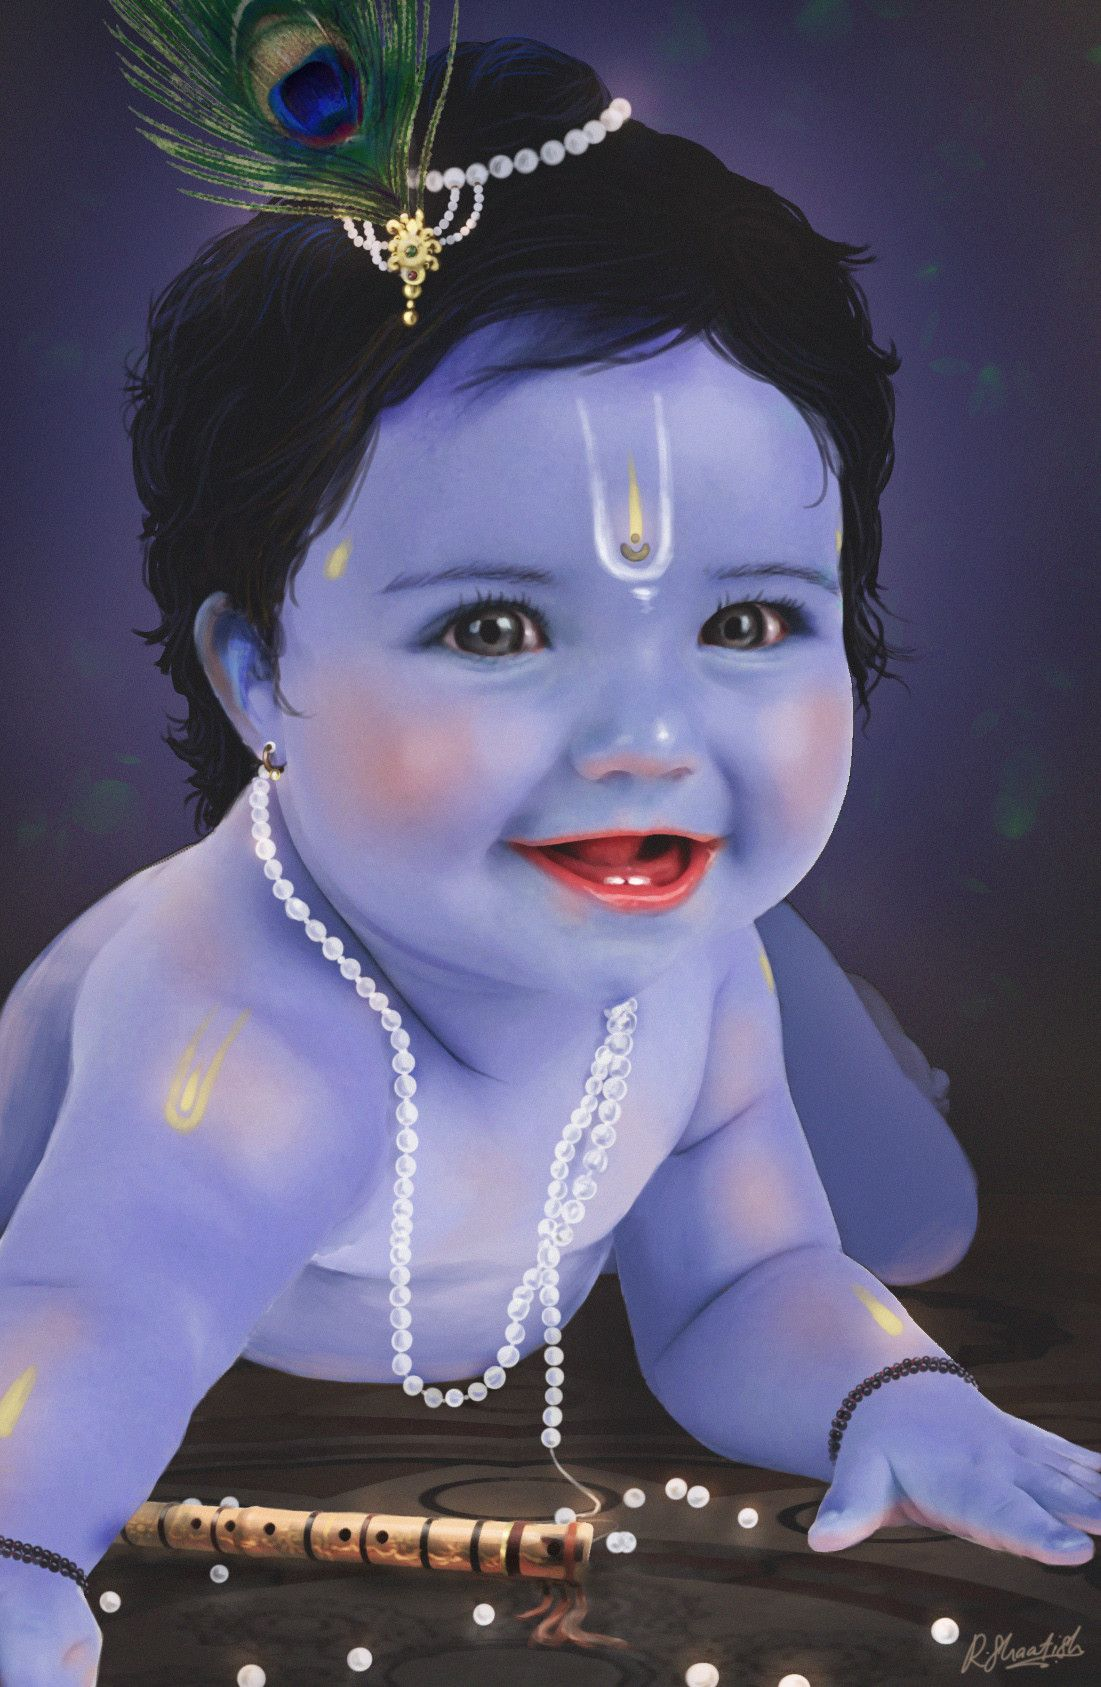 Paramchaintanya Men Shaatish Rajendranconcept Artist And 3d Animator Baby Krishna Little Krishna Lord Krishna Images